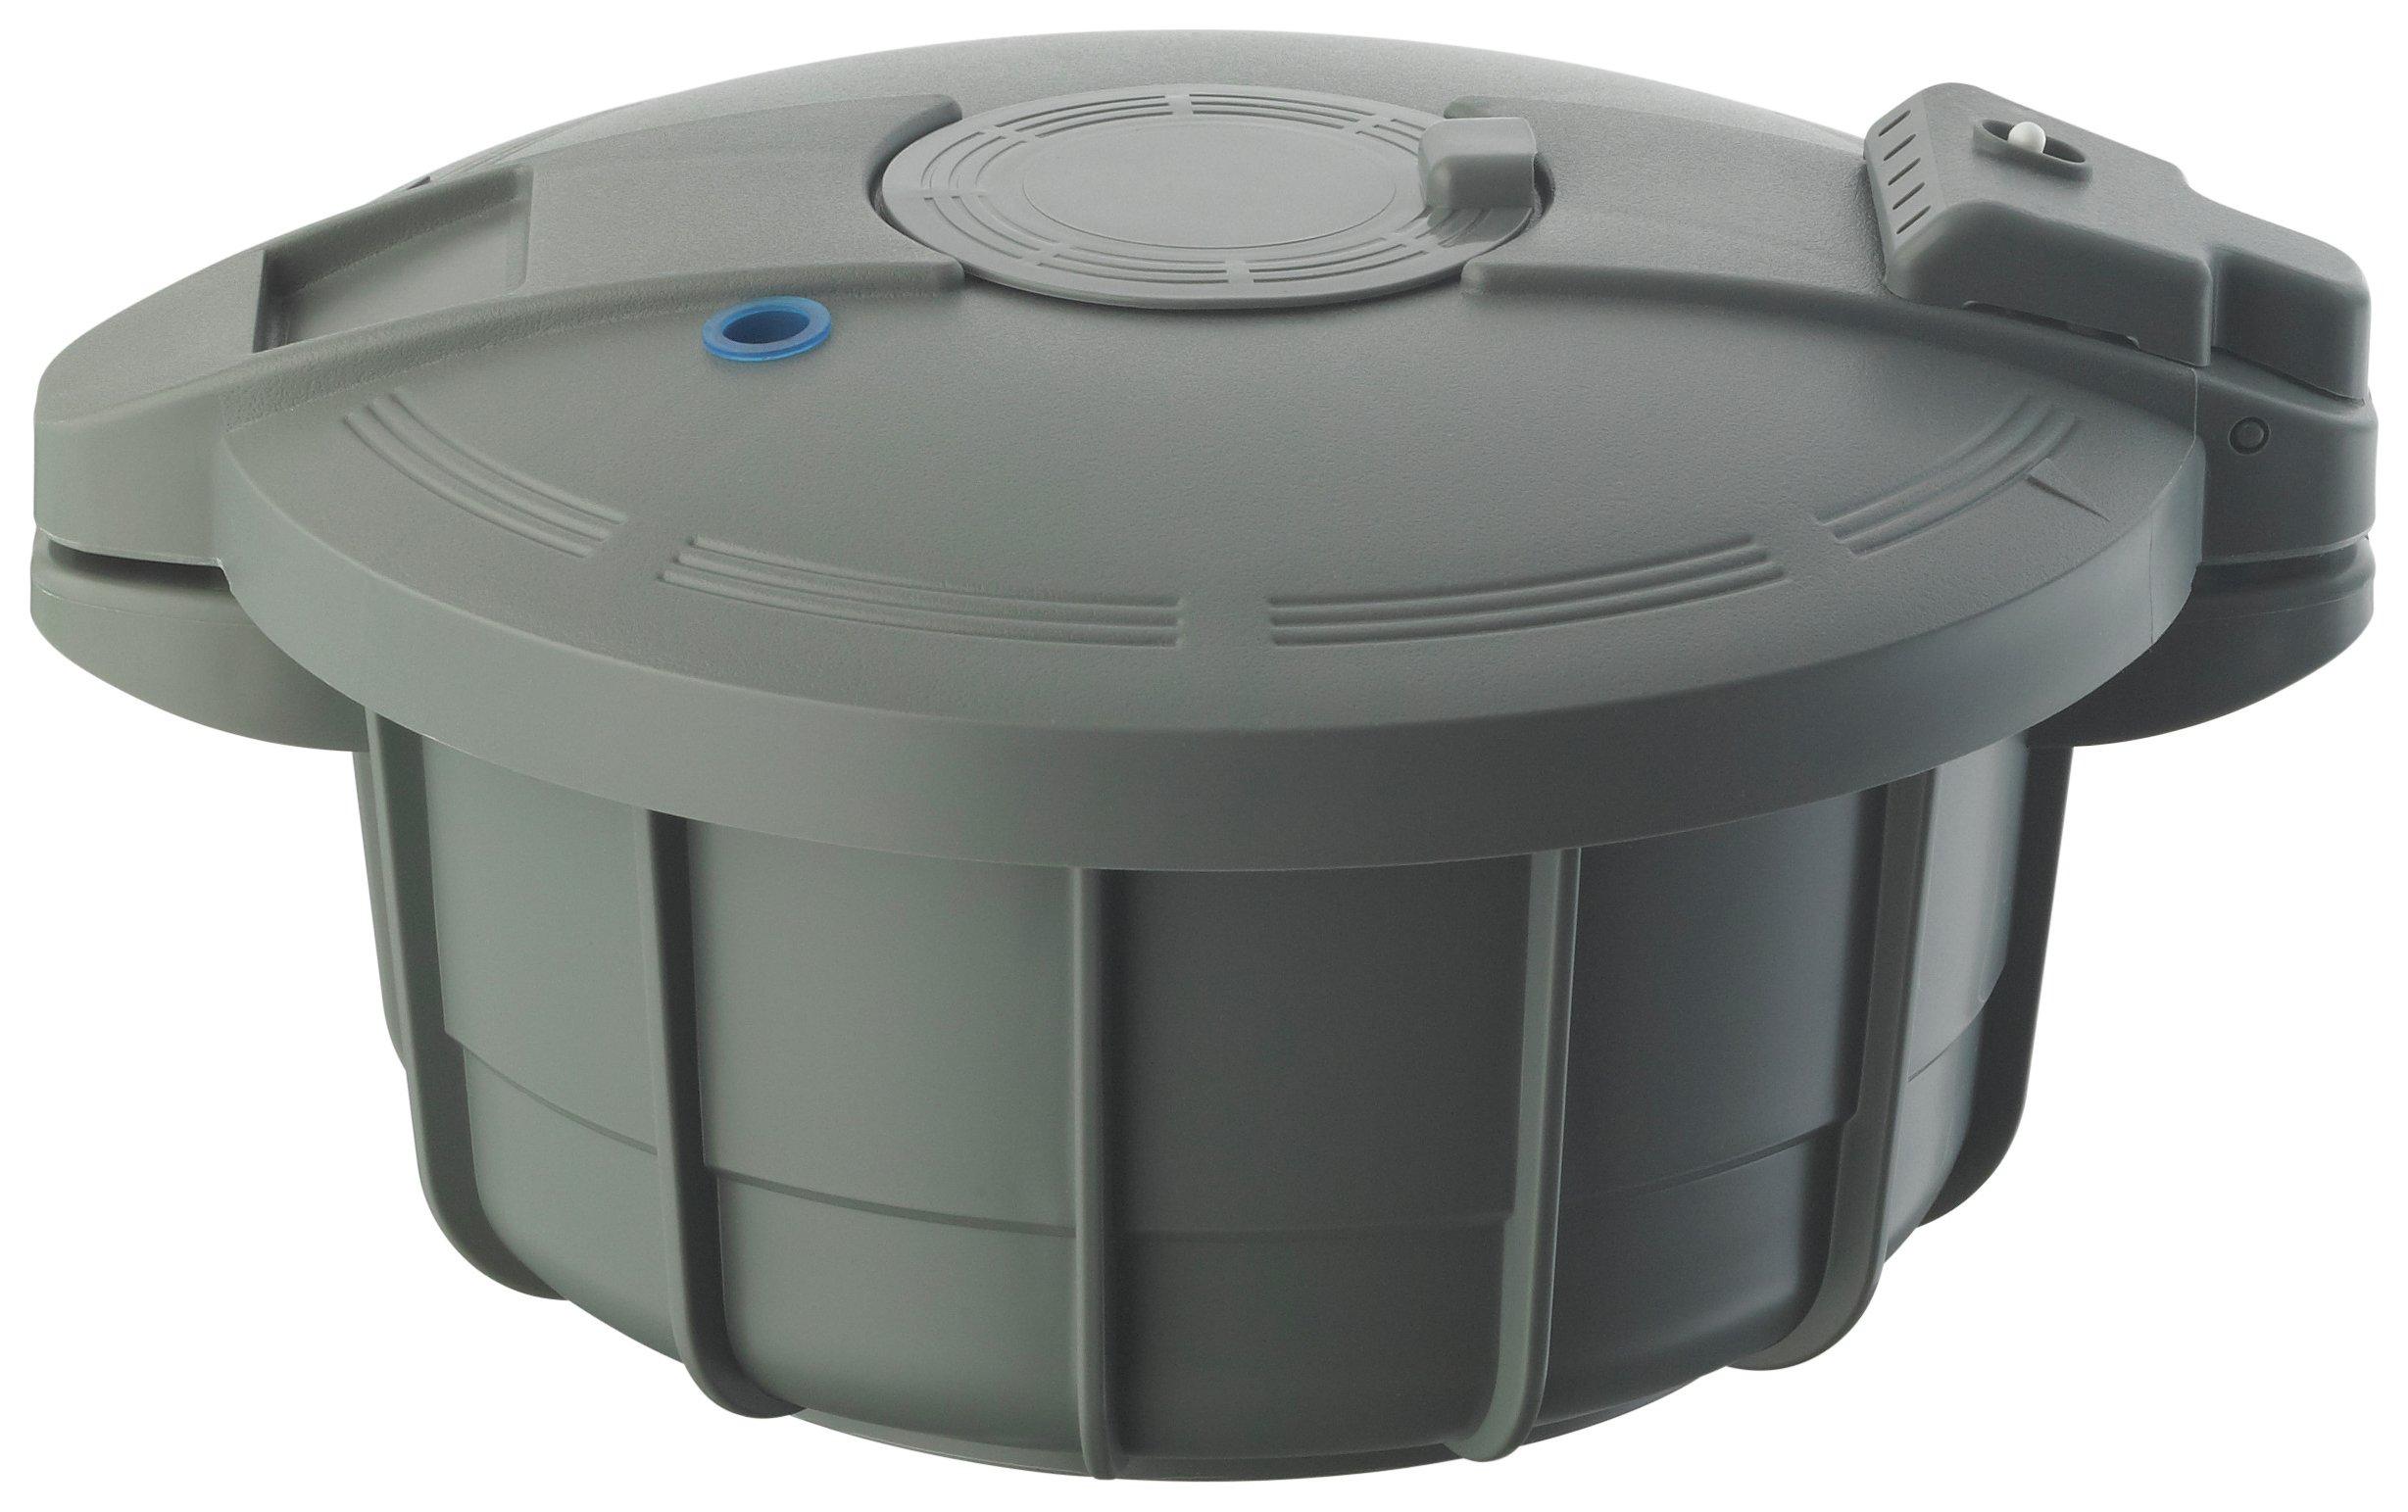 Image of Prestige Microwave 2.2L Pressure Cooker - Grey.